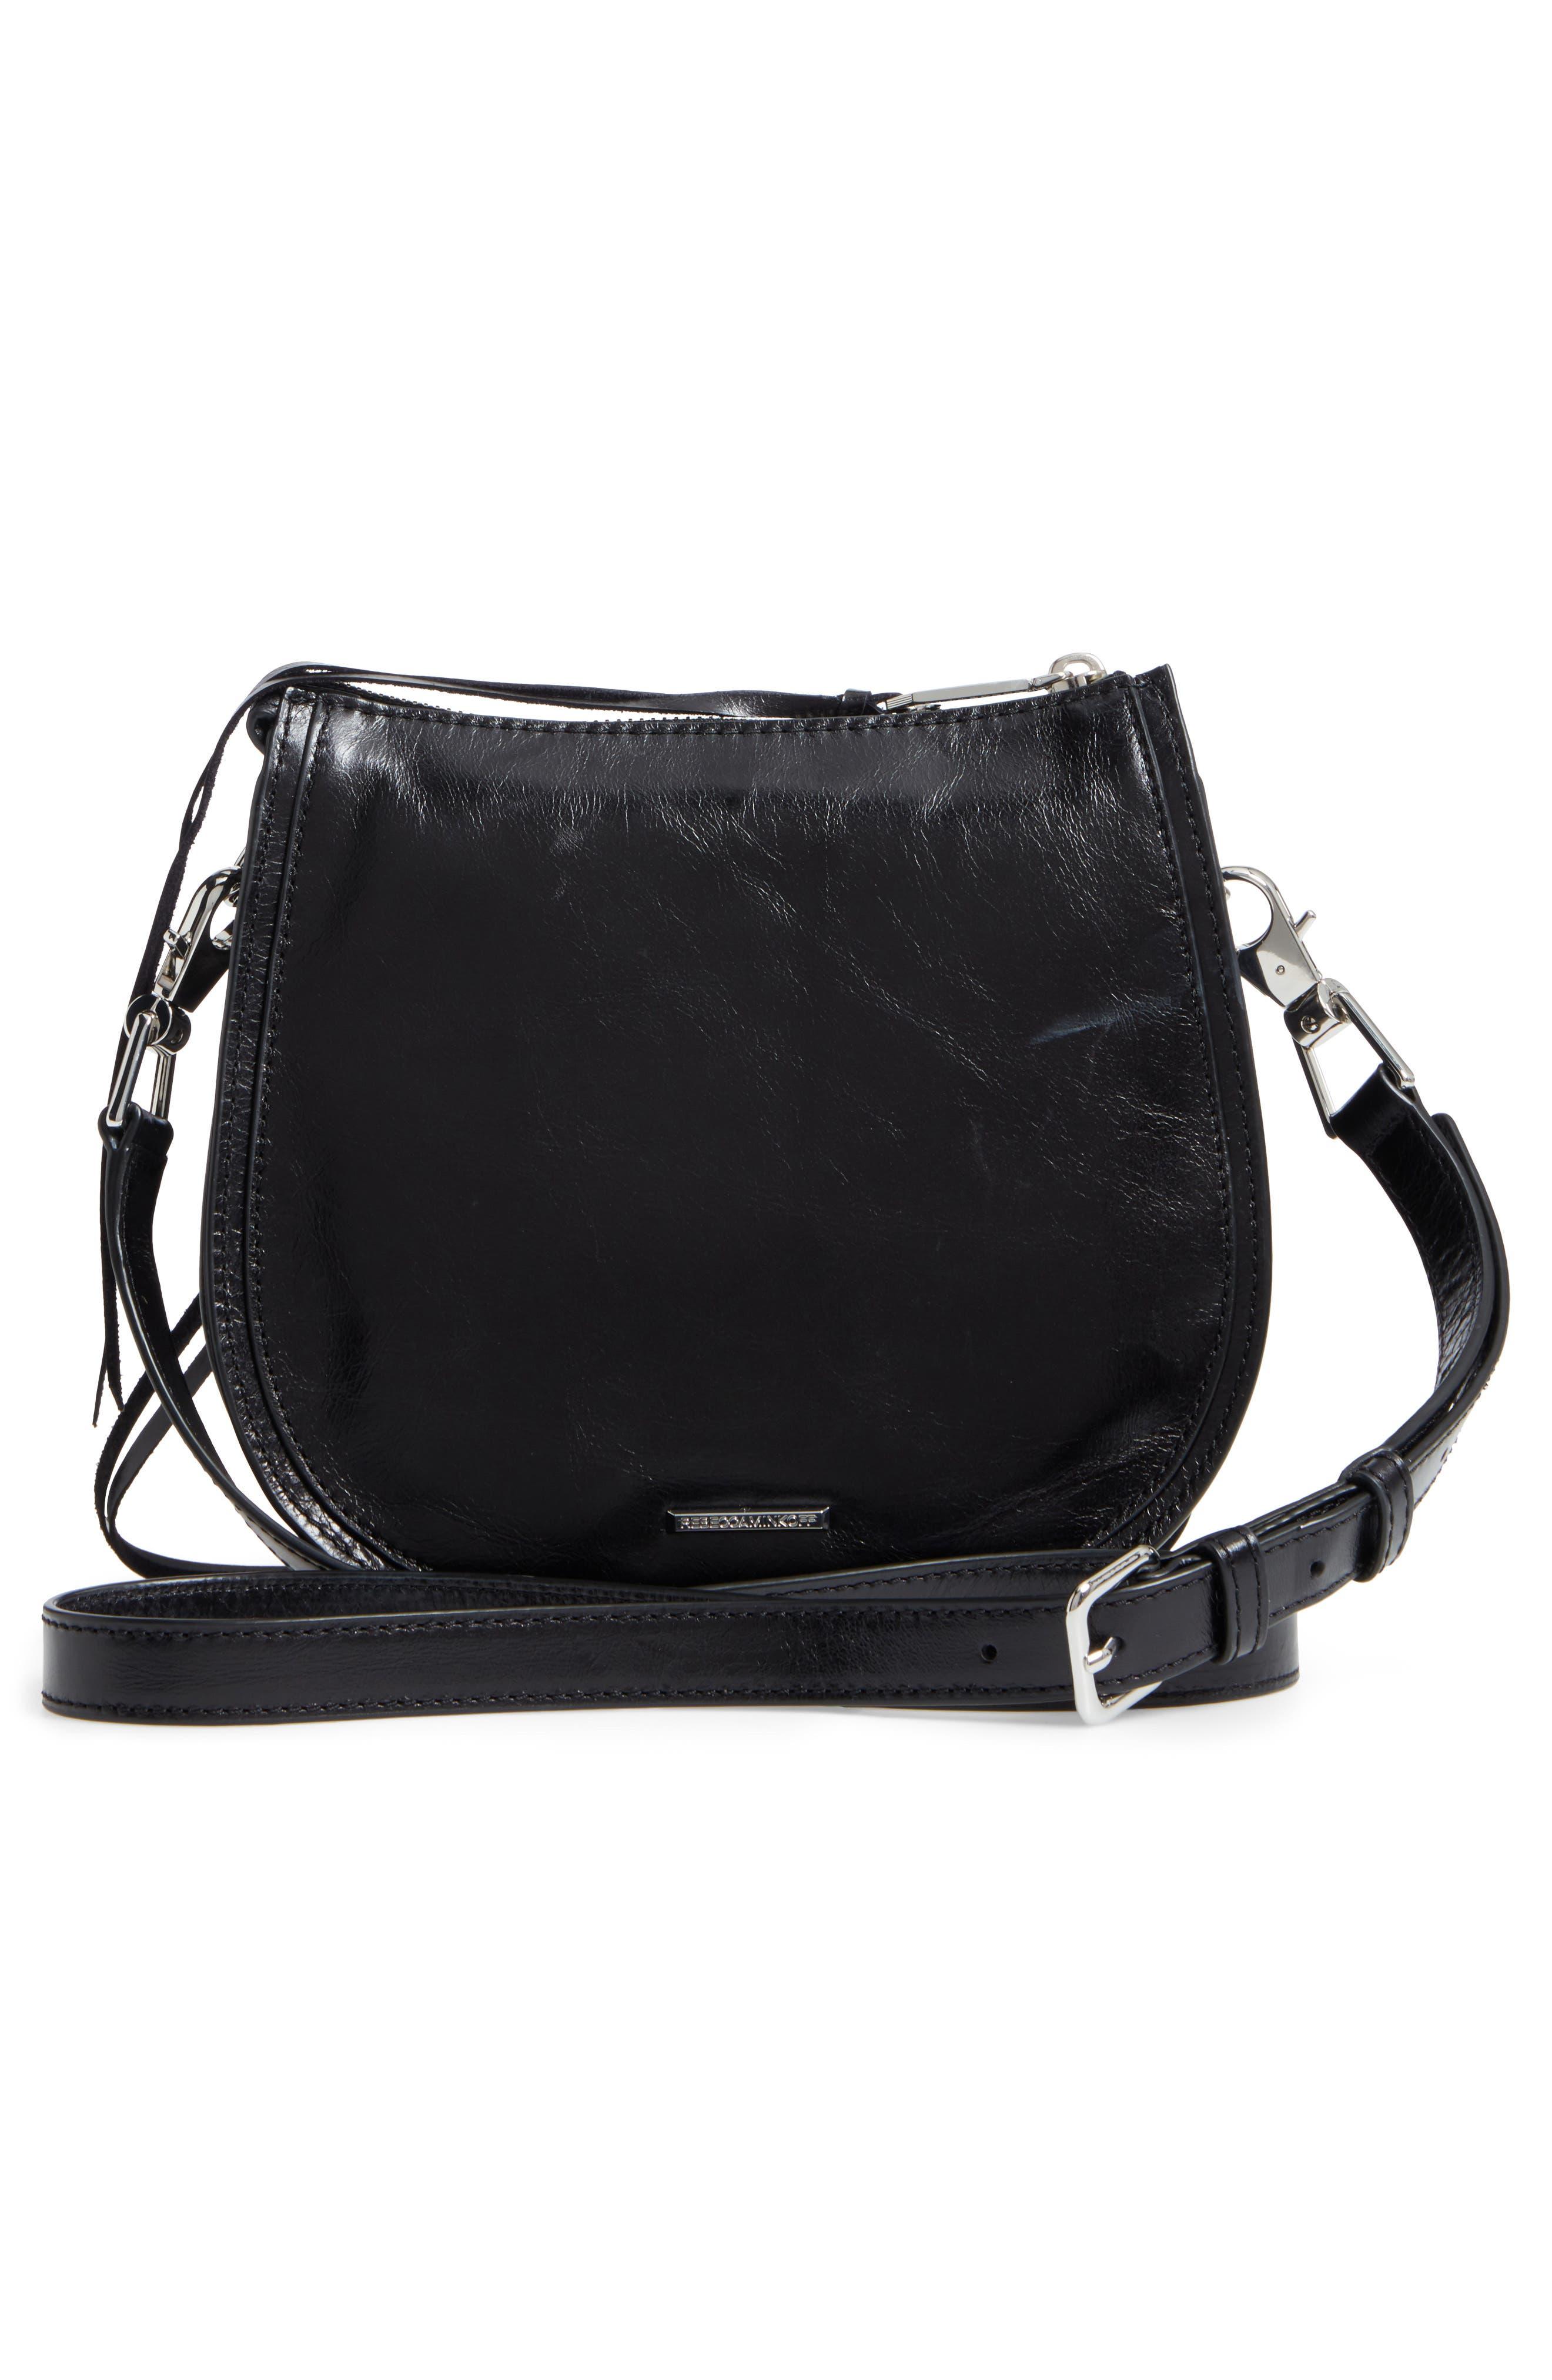 Alternate Image 3  - Rebecca Minkoff Mini Vanity Leather Saddle Bag